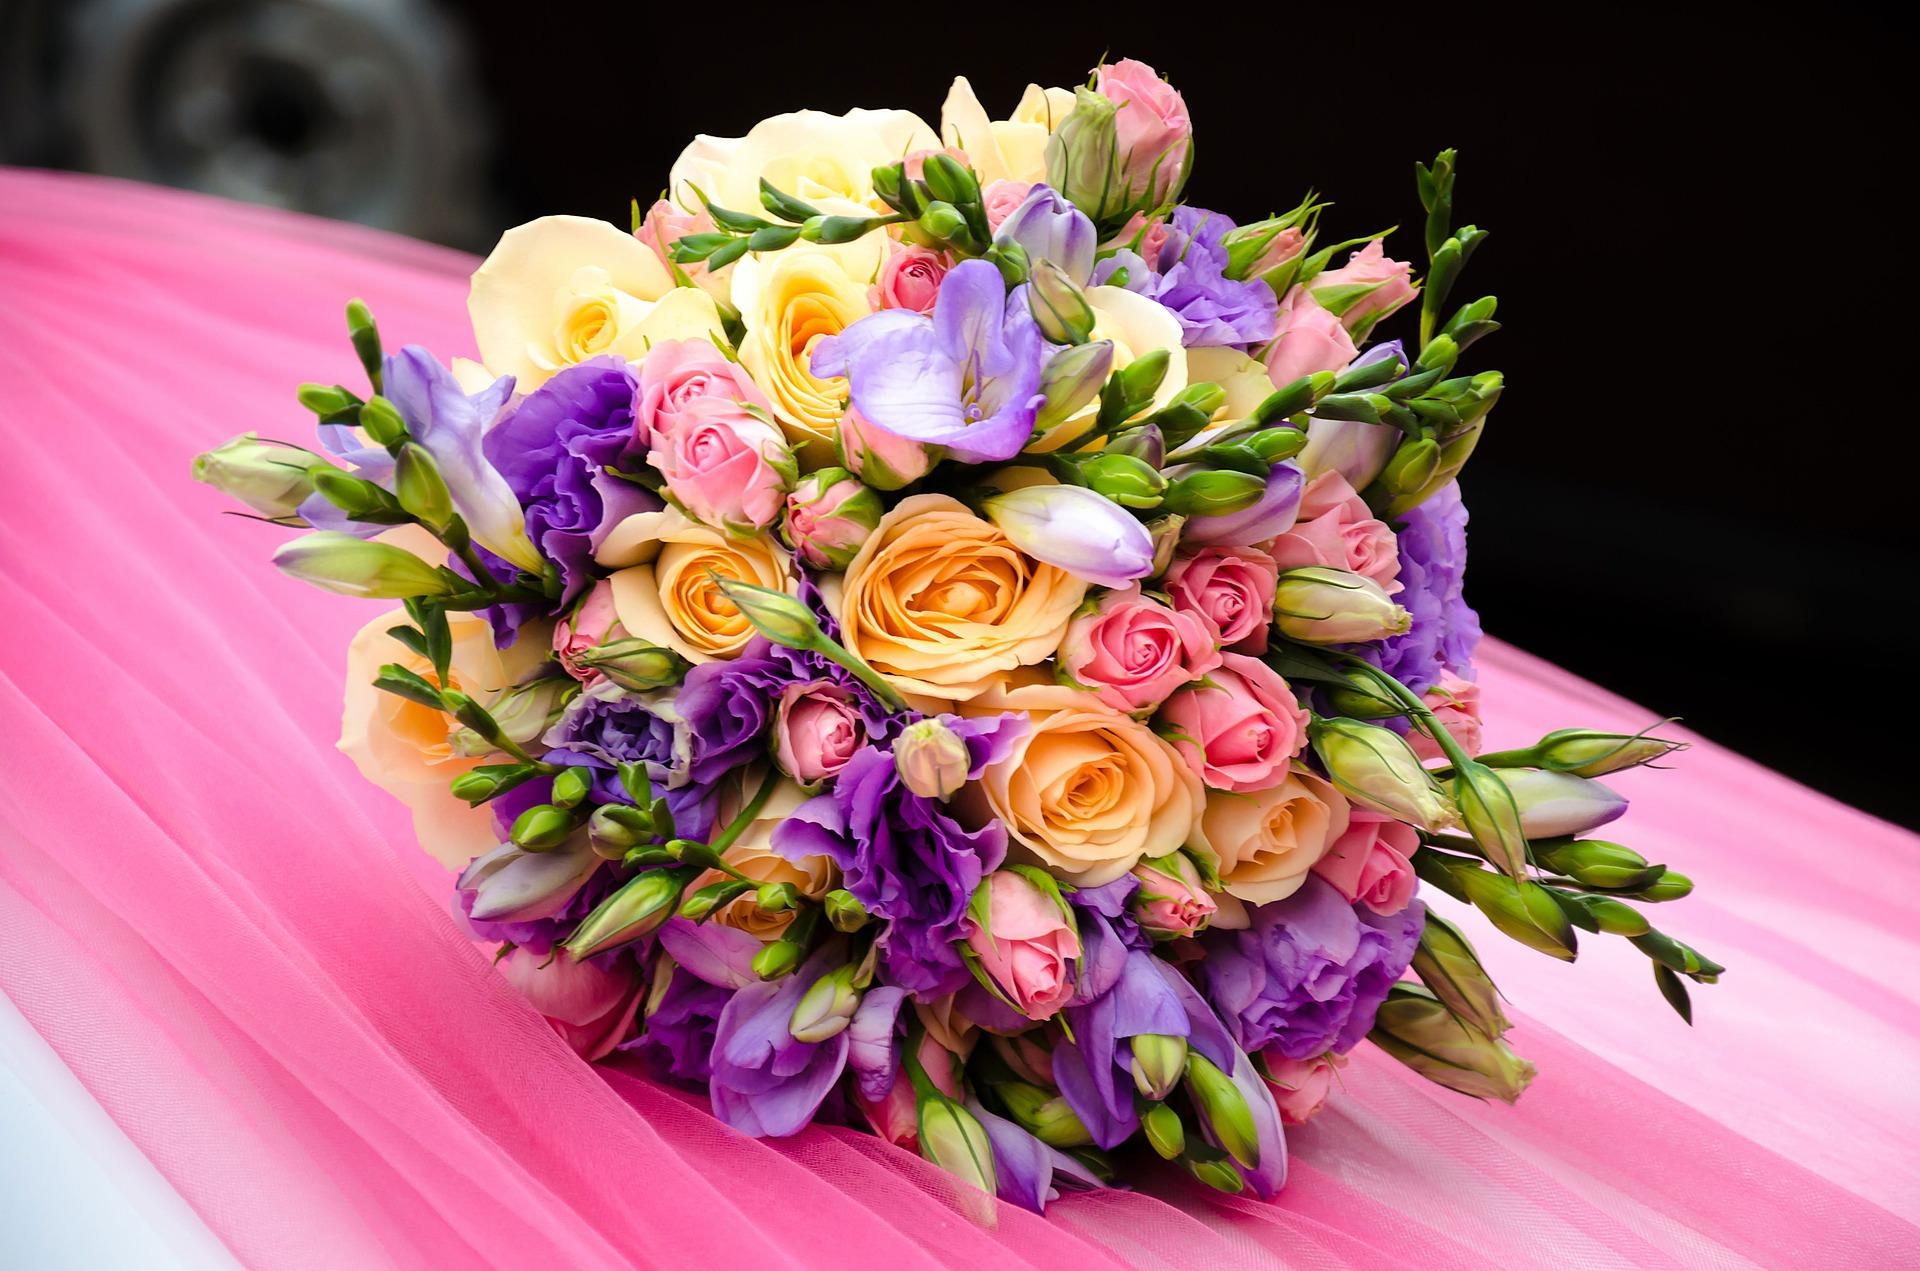 flowers-609165_1920